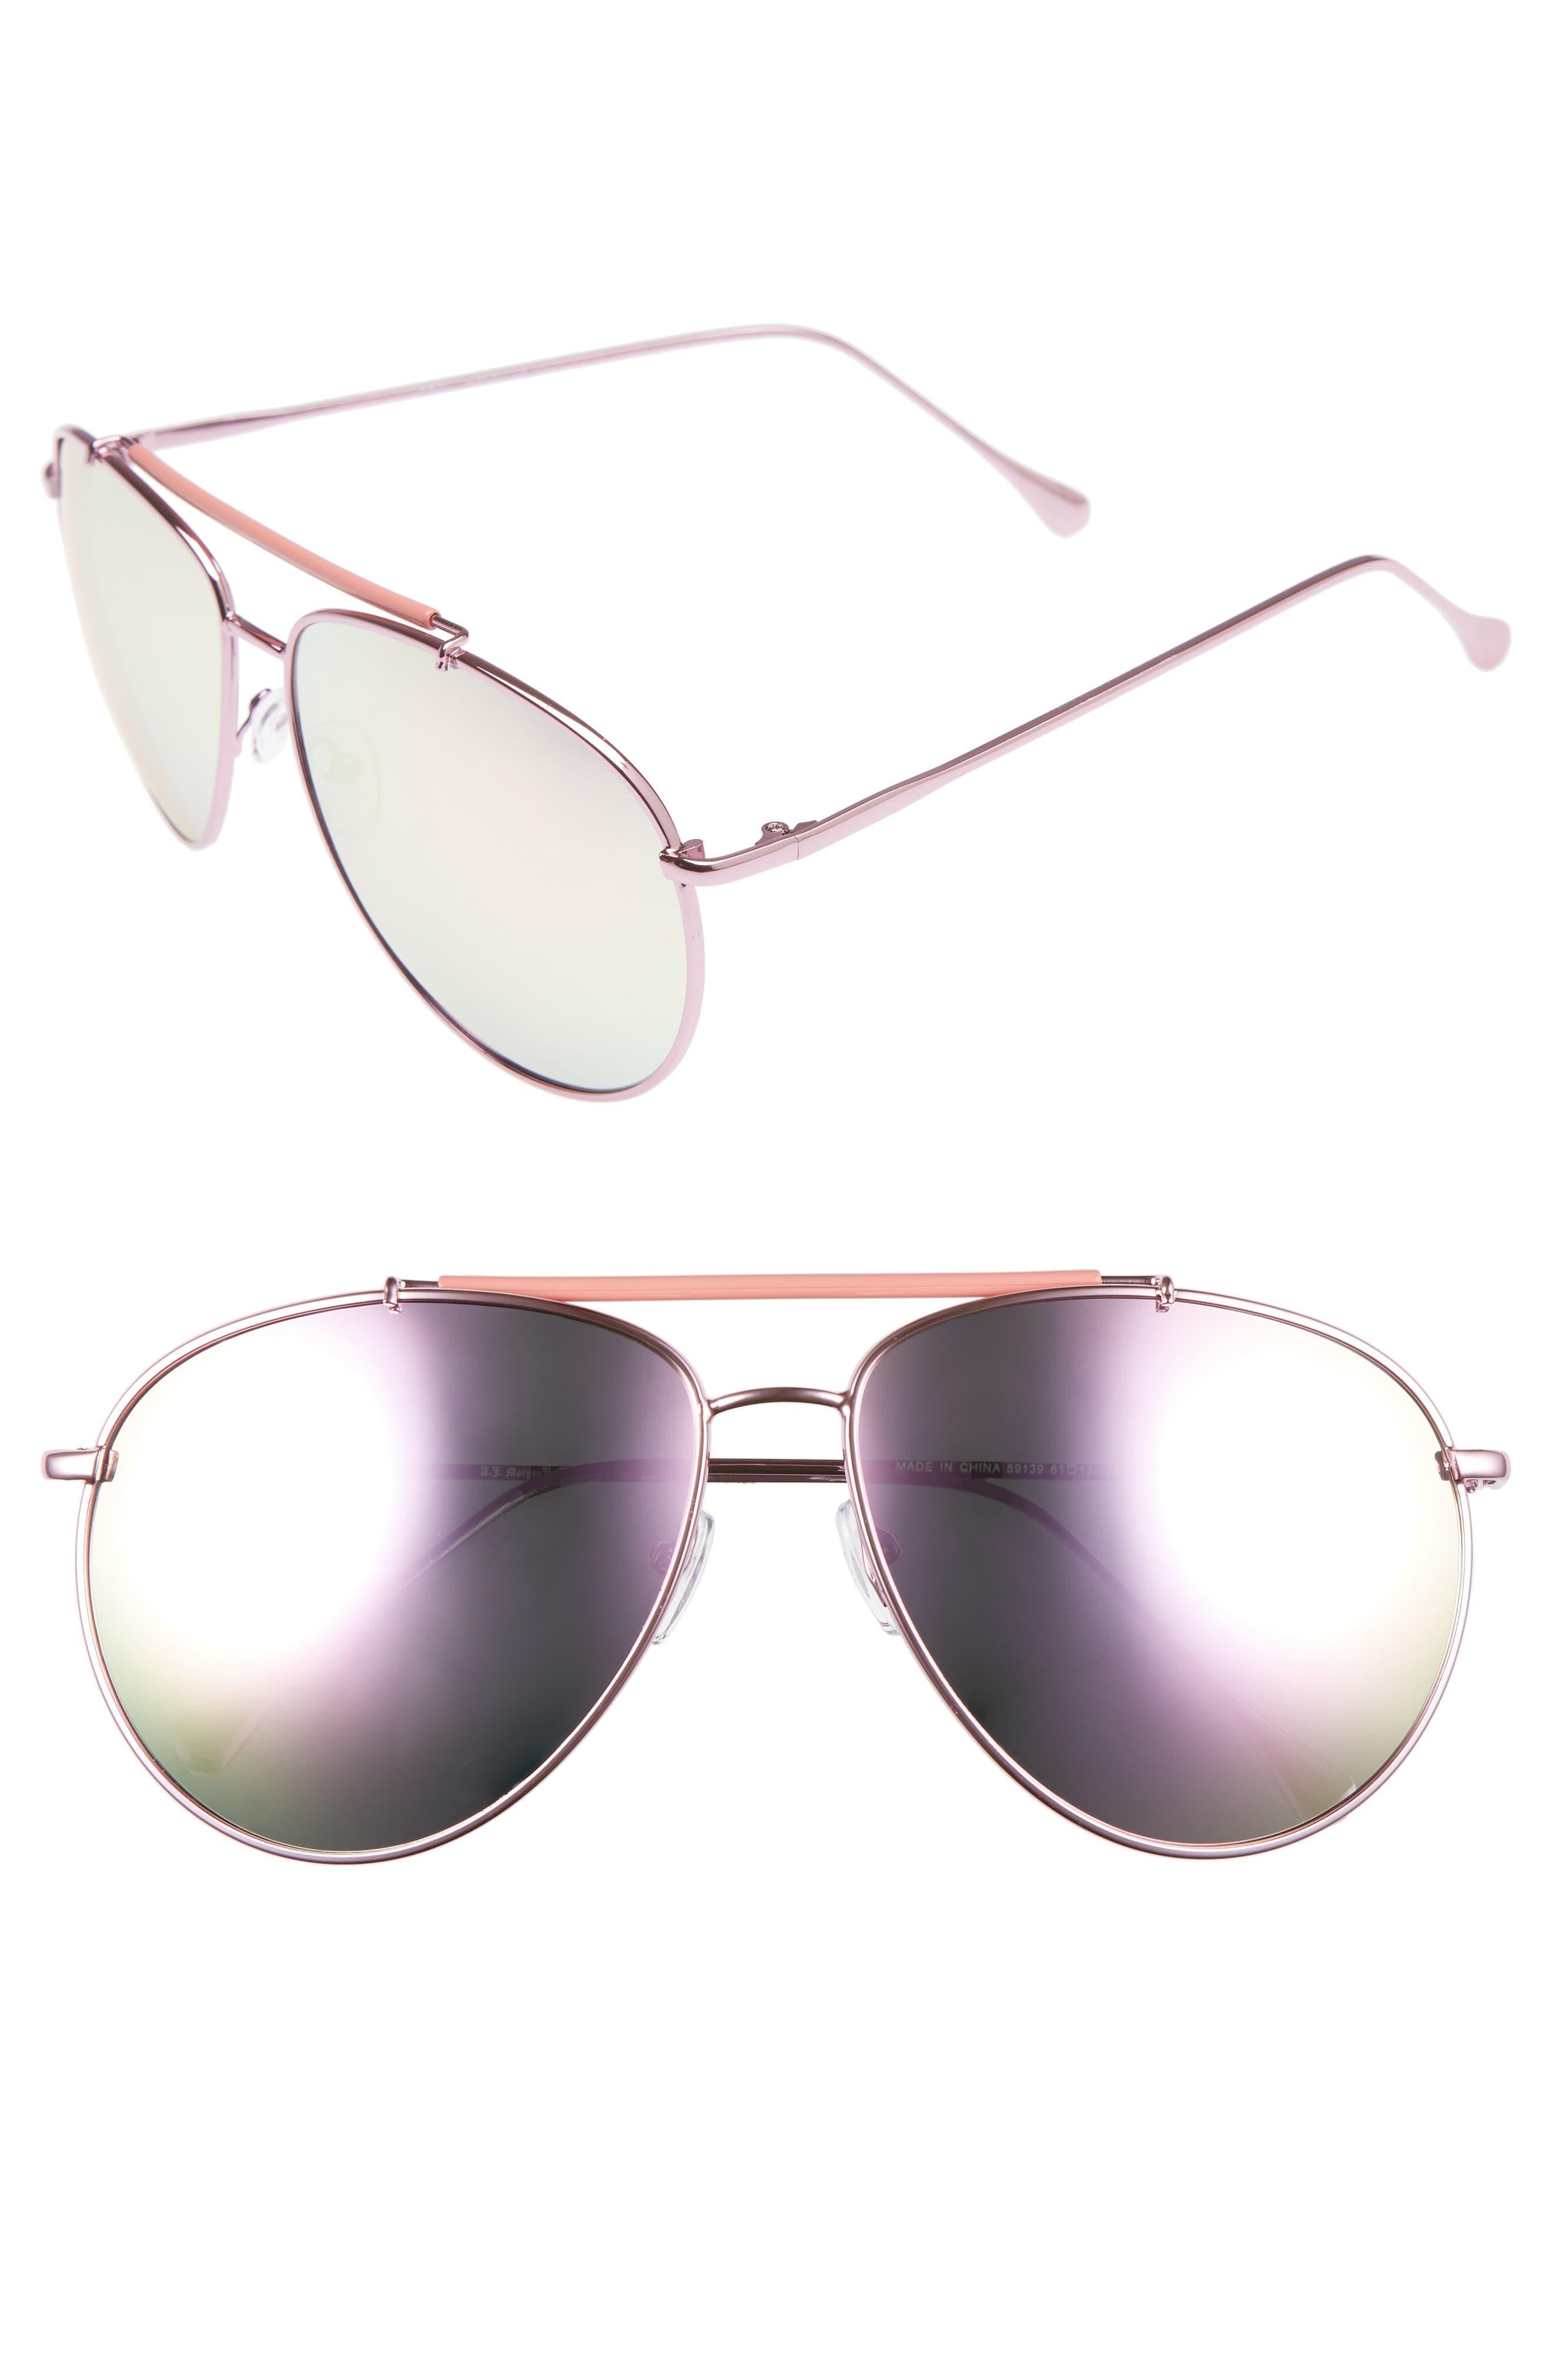 A.J. Morgan Skyward 61mm Aviator Sunglasses